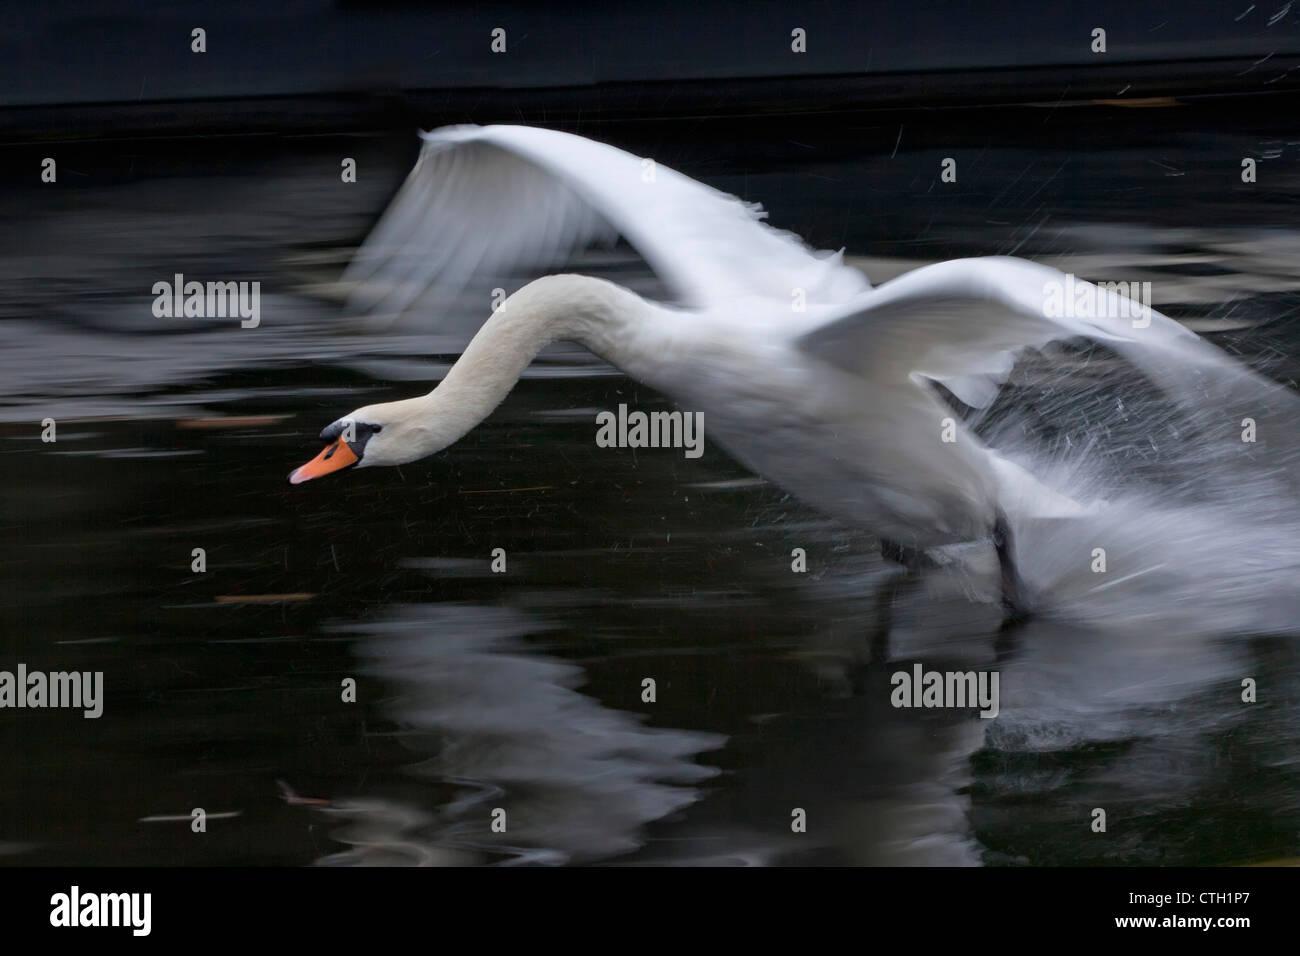 Den Niederlanden,'s-Graveland, Landung der Höckerschwan (Cygnus Olor). Stockbild